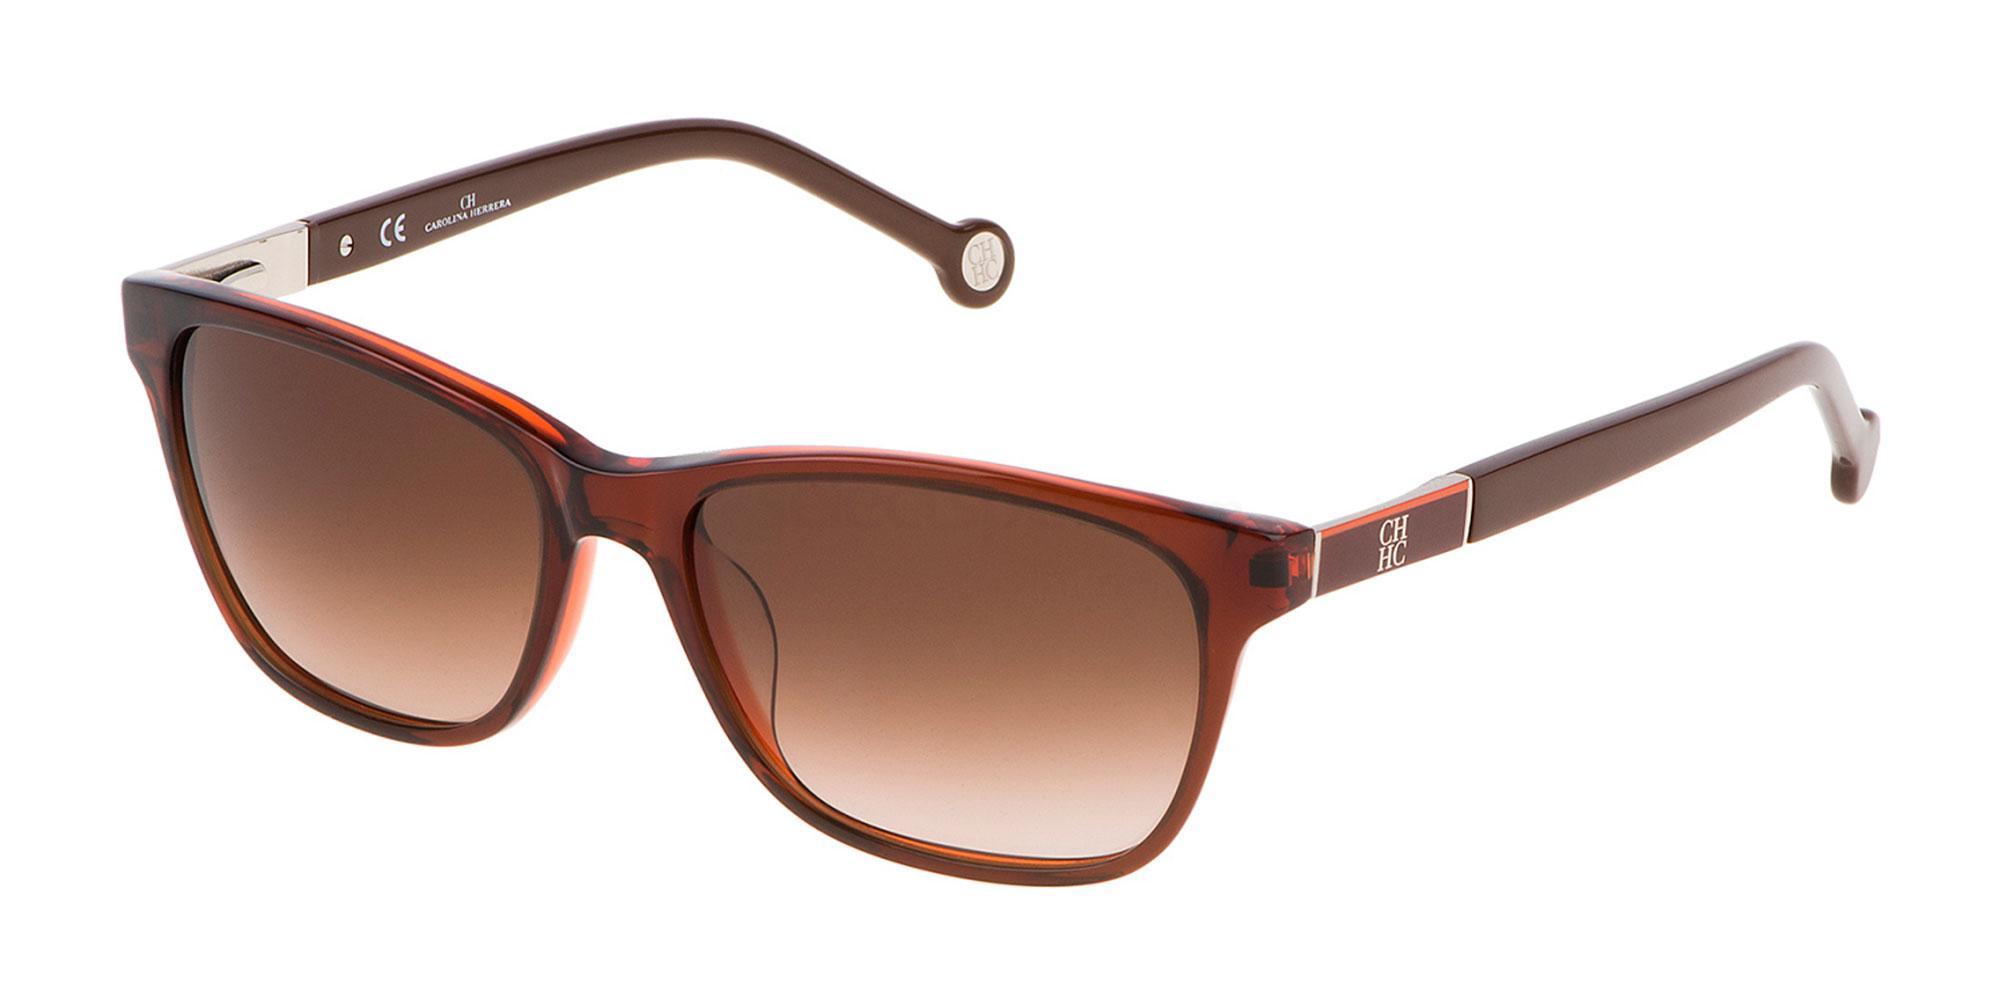 06MM SHE643 Sunglasses, CH Carolina Herrera